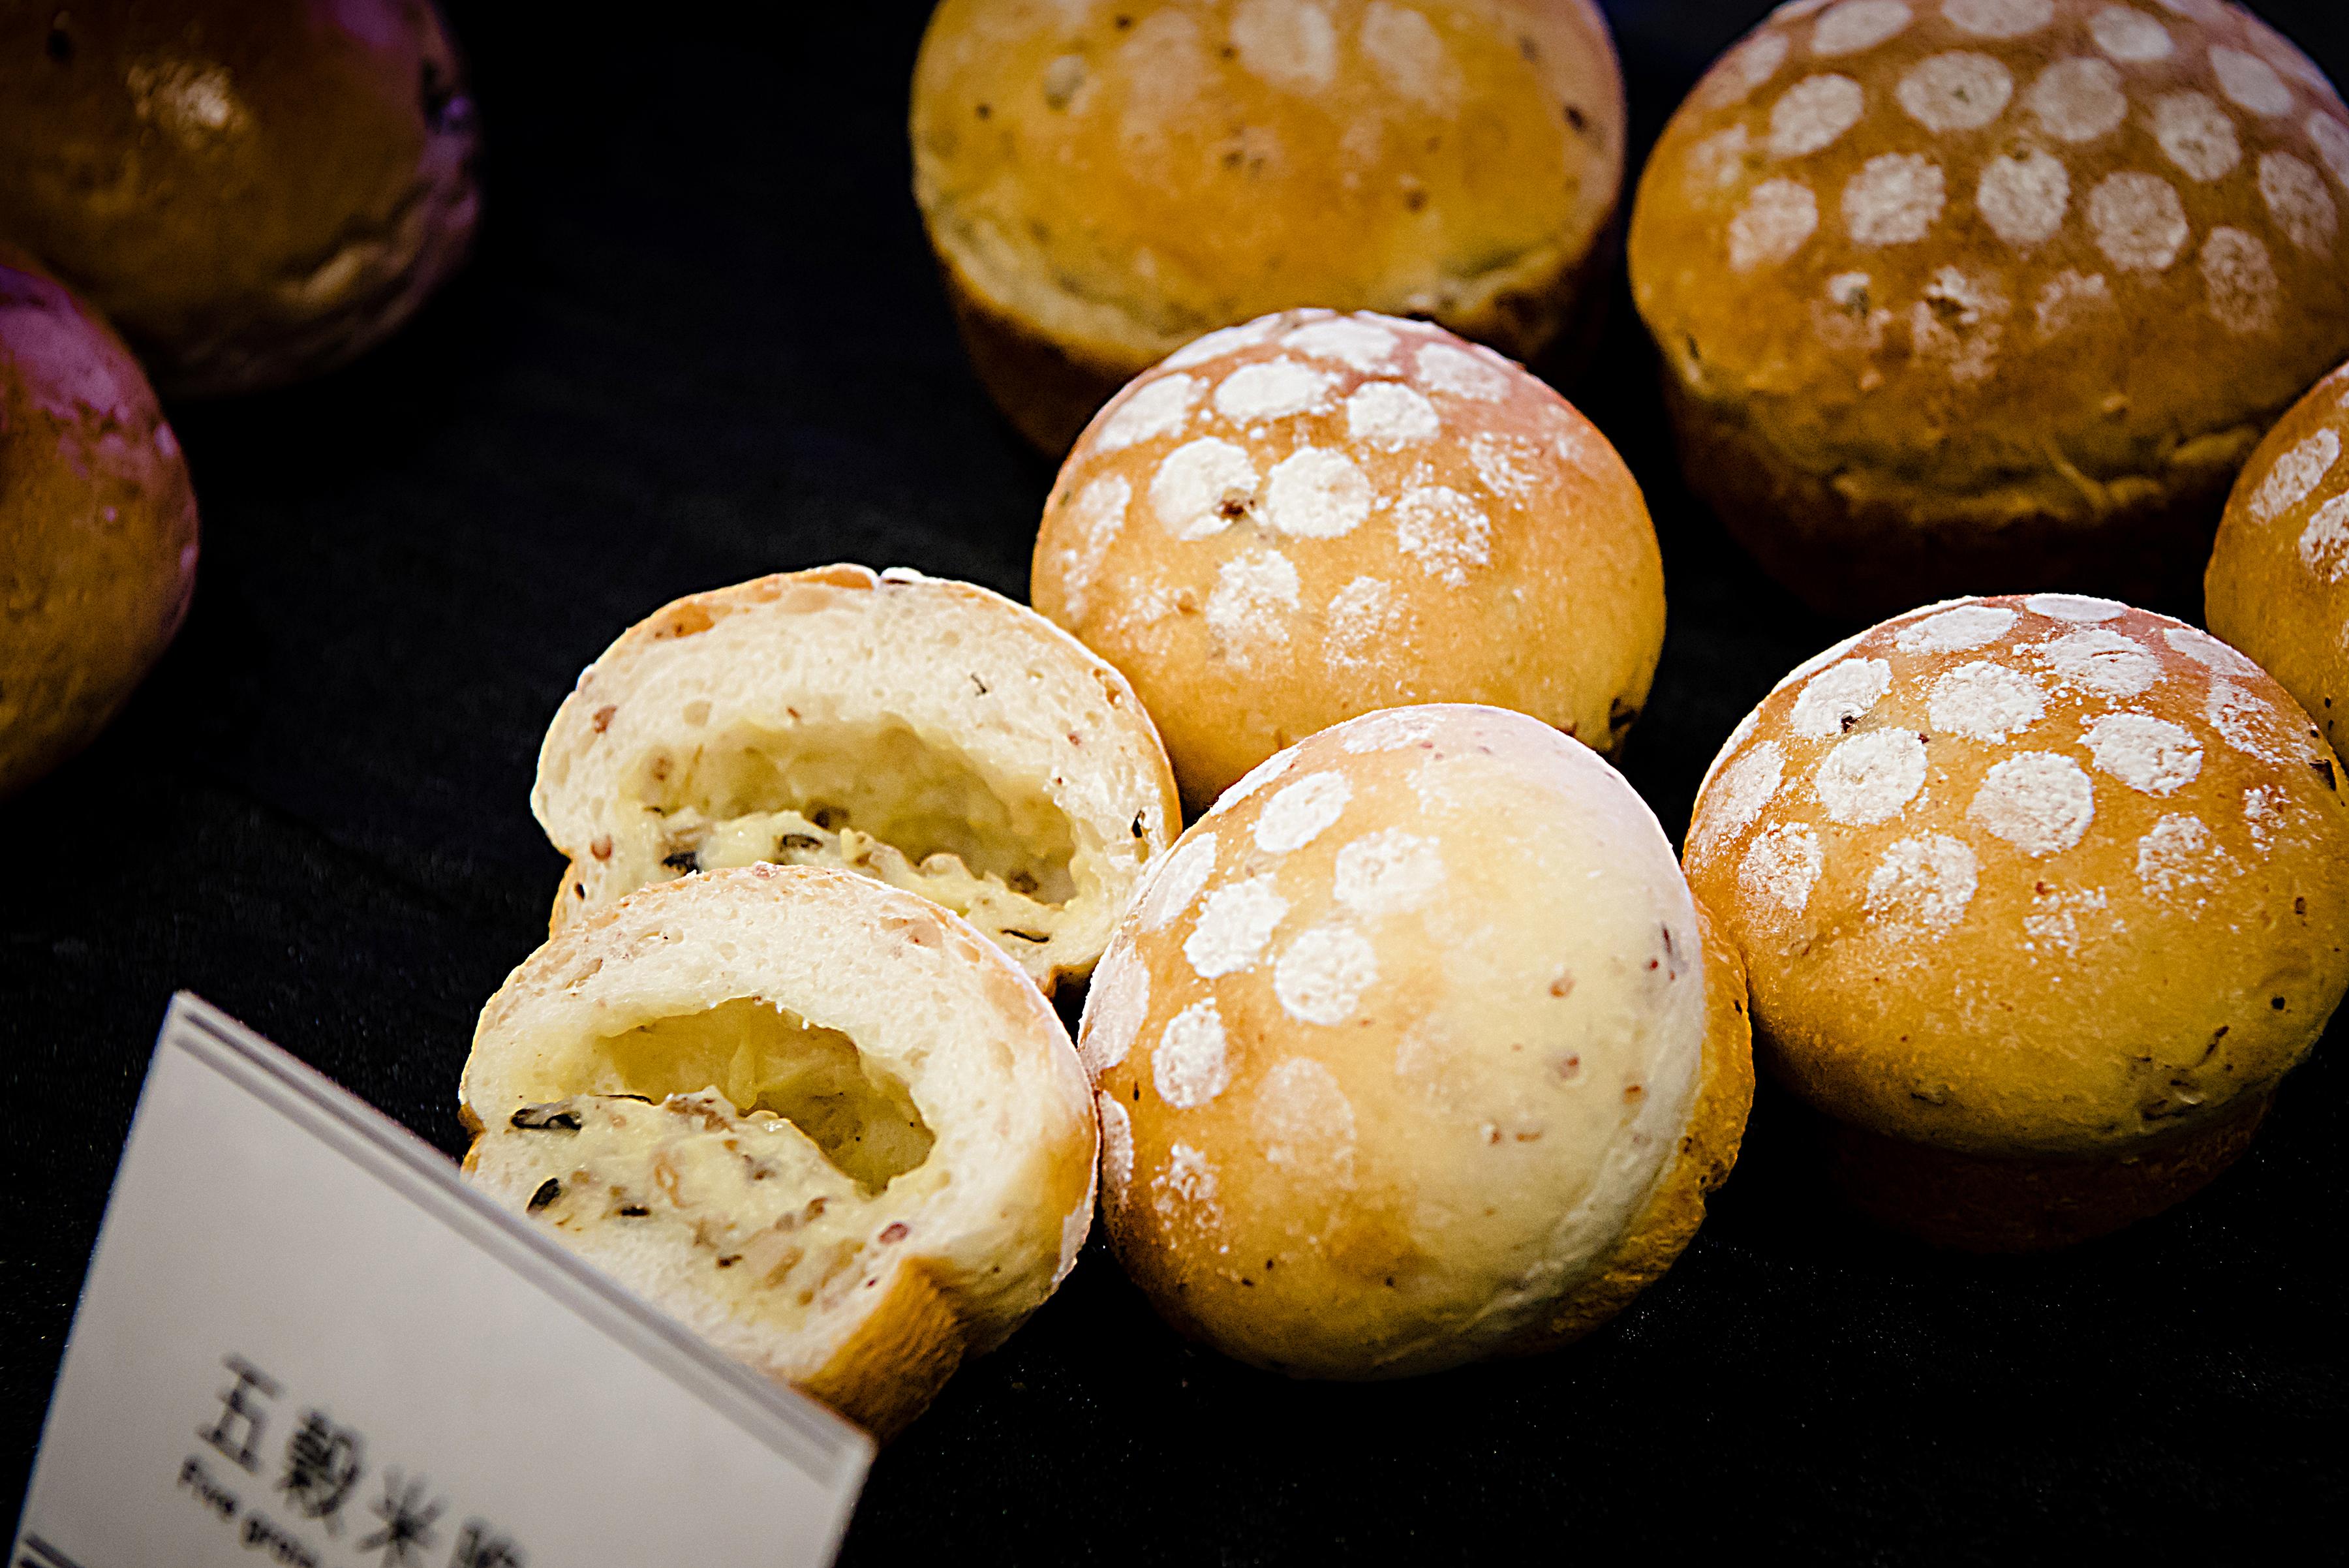 Baking Five Grains Mushroom Bread